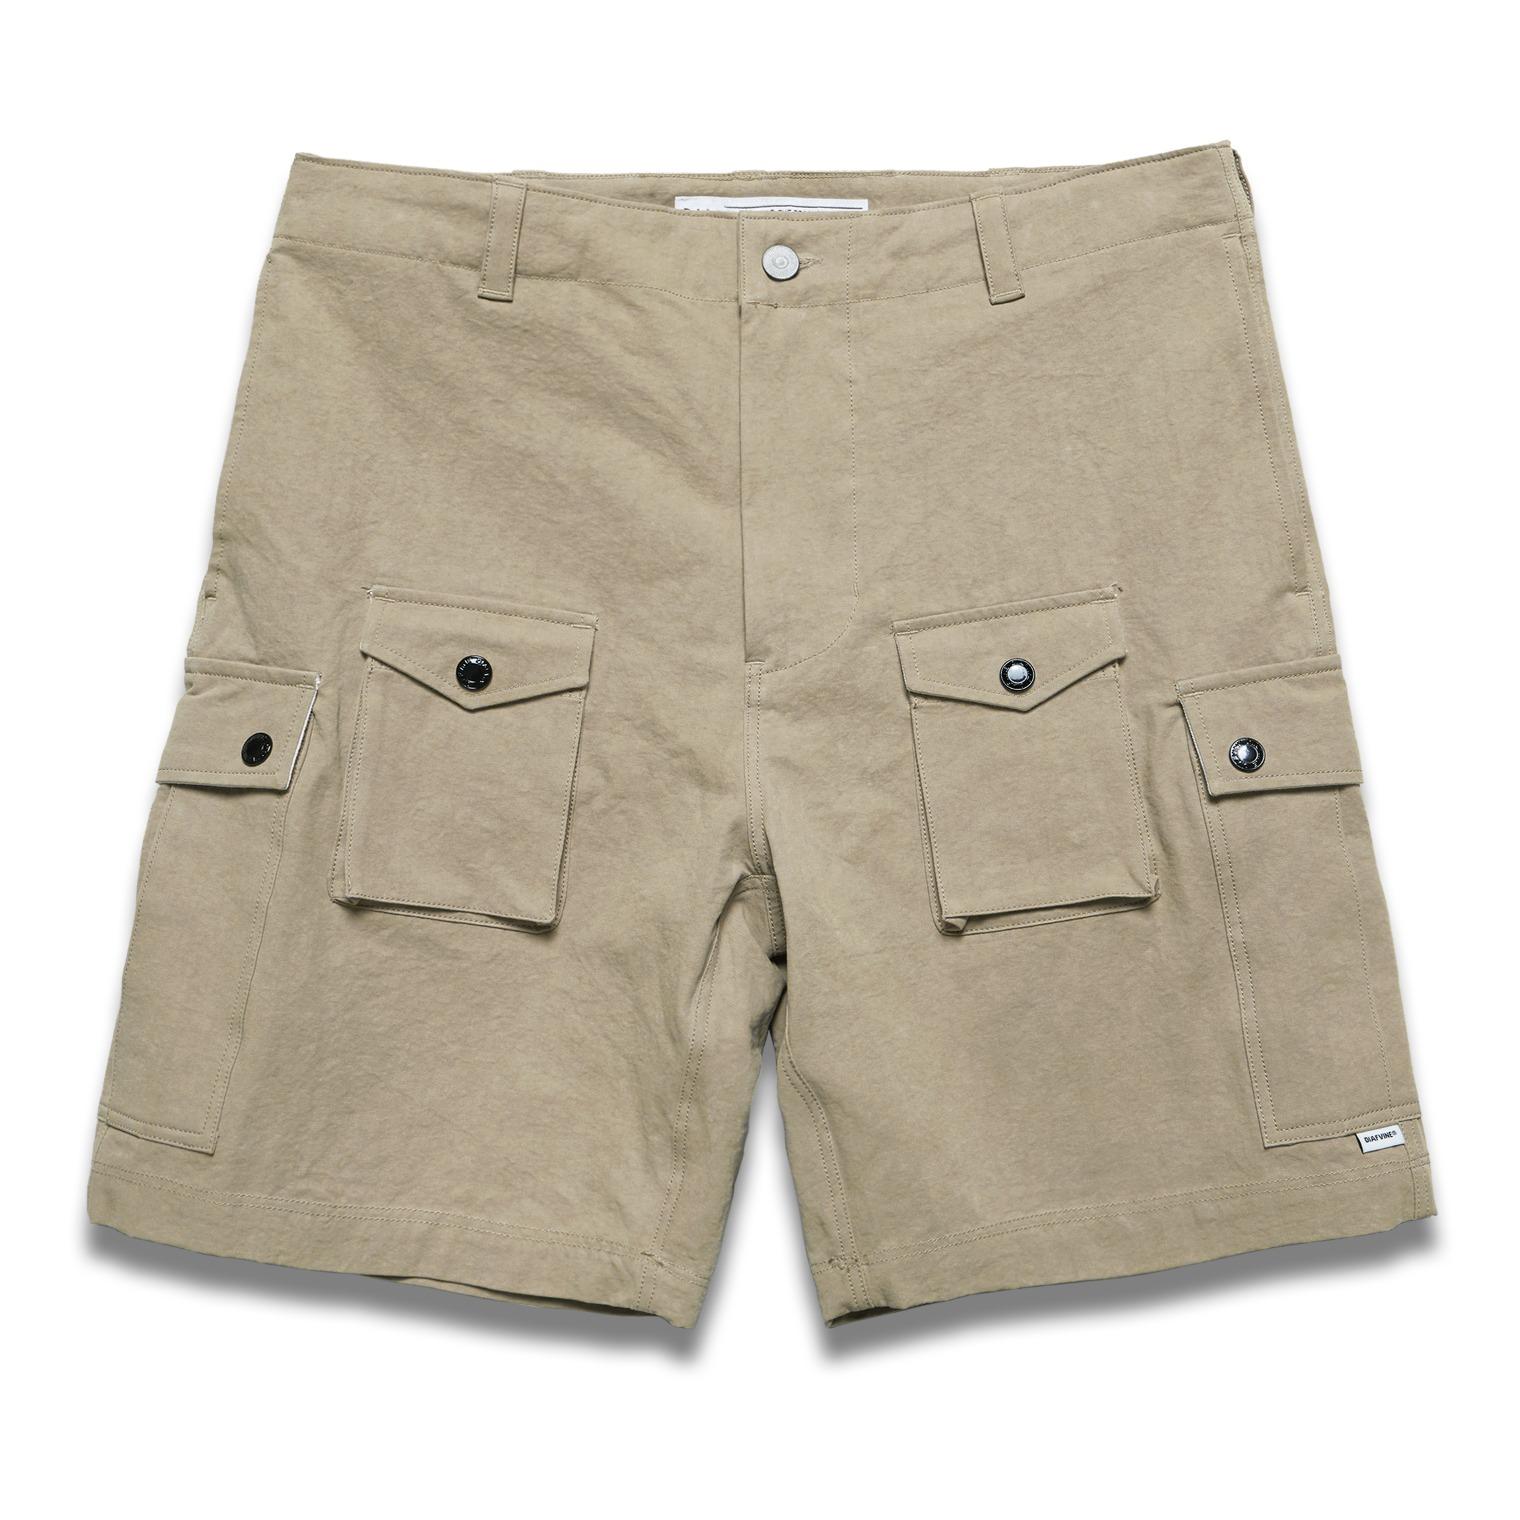 DV.LOT 640 Utility Shorts -BEIGE-